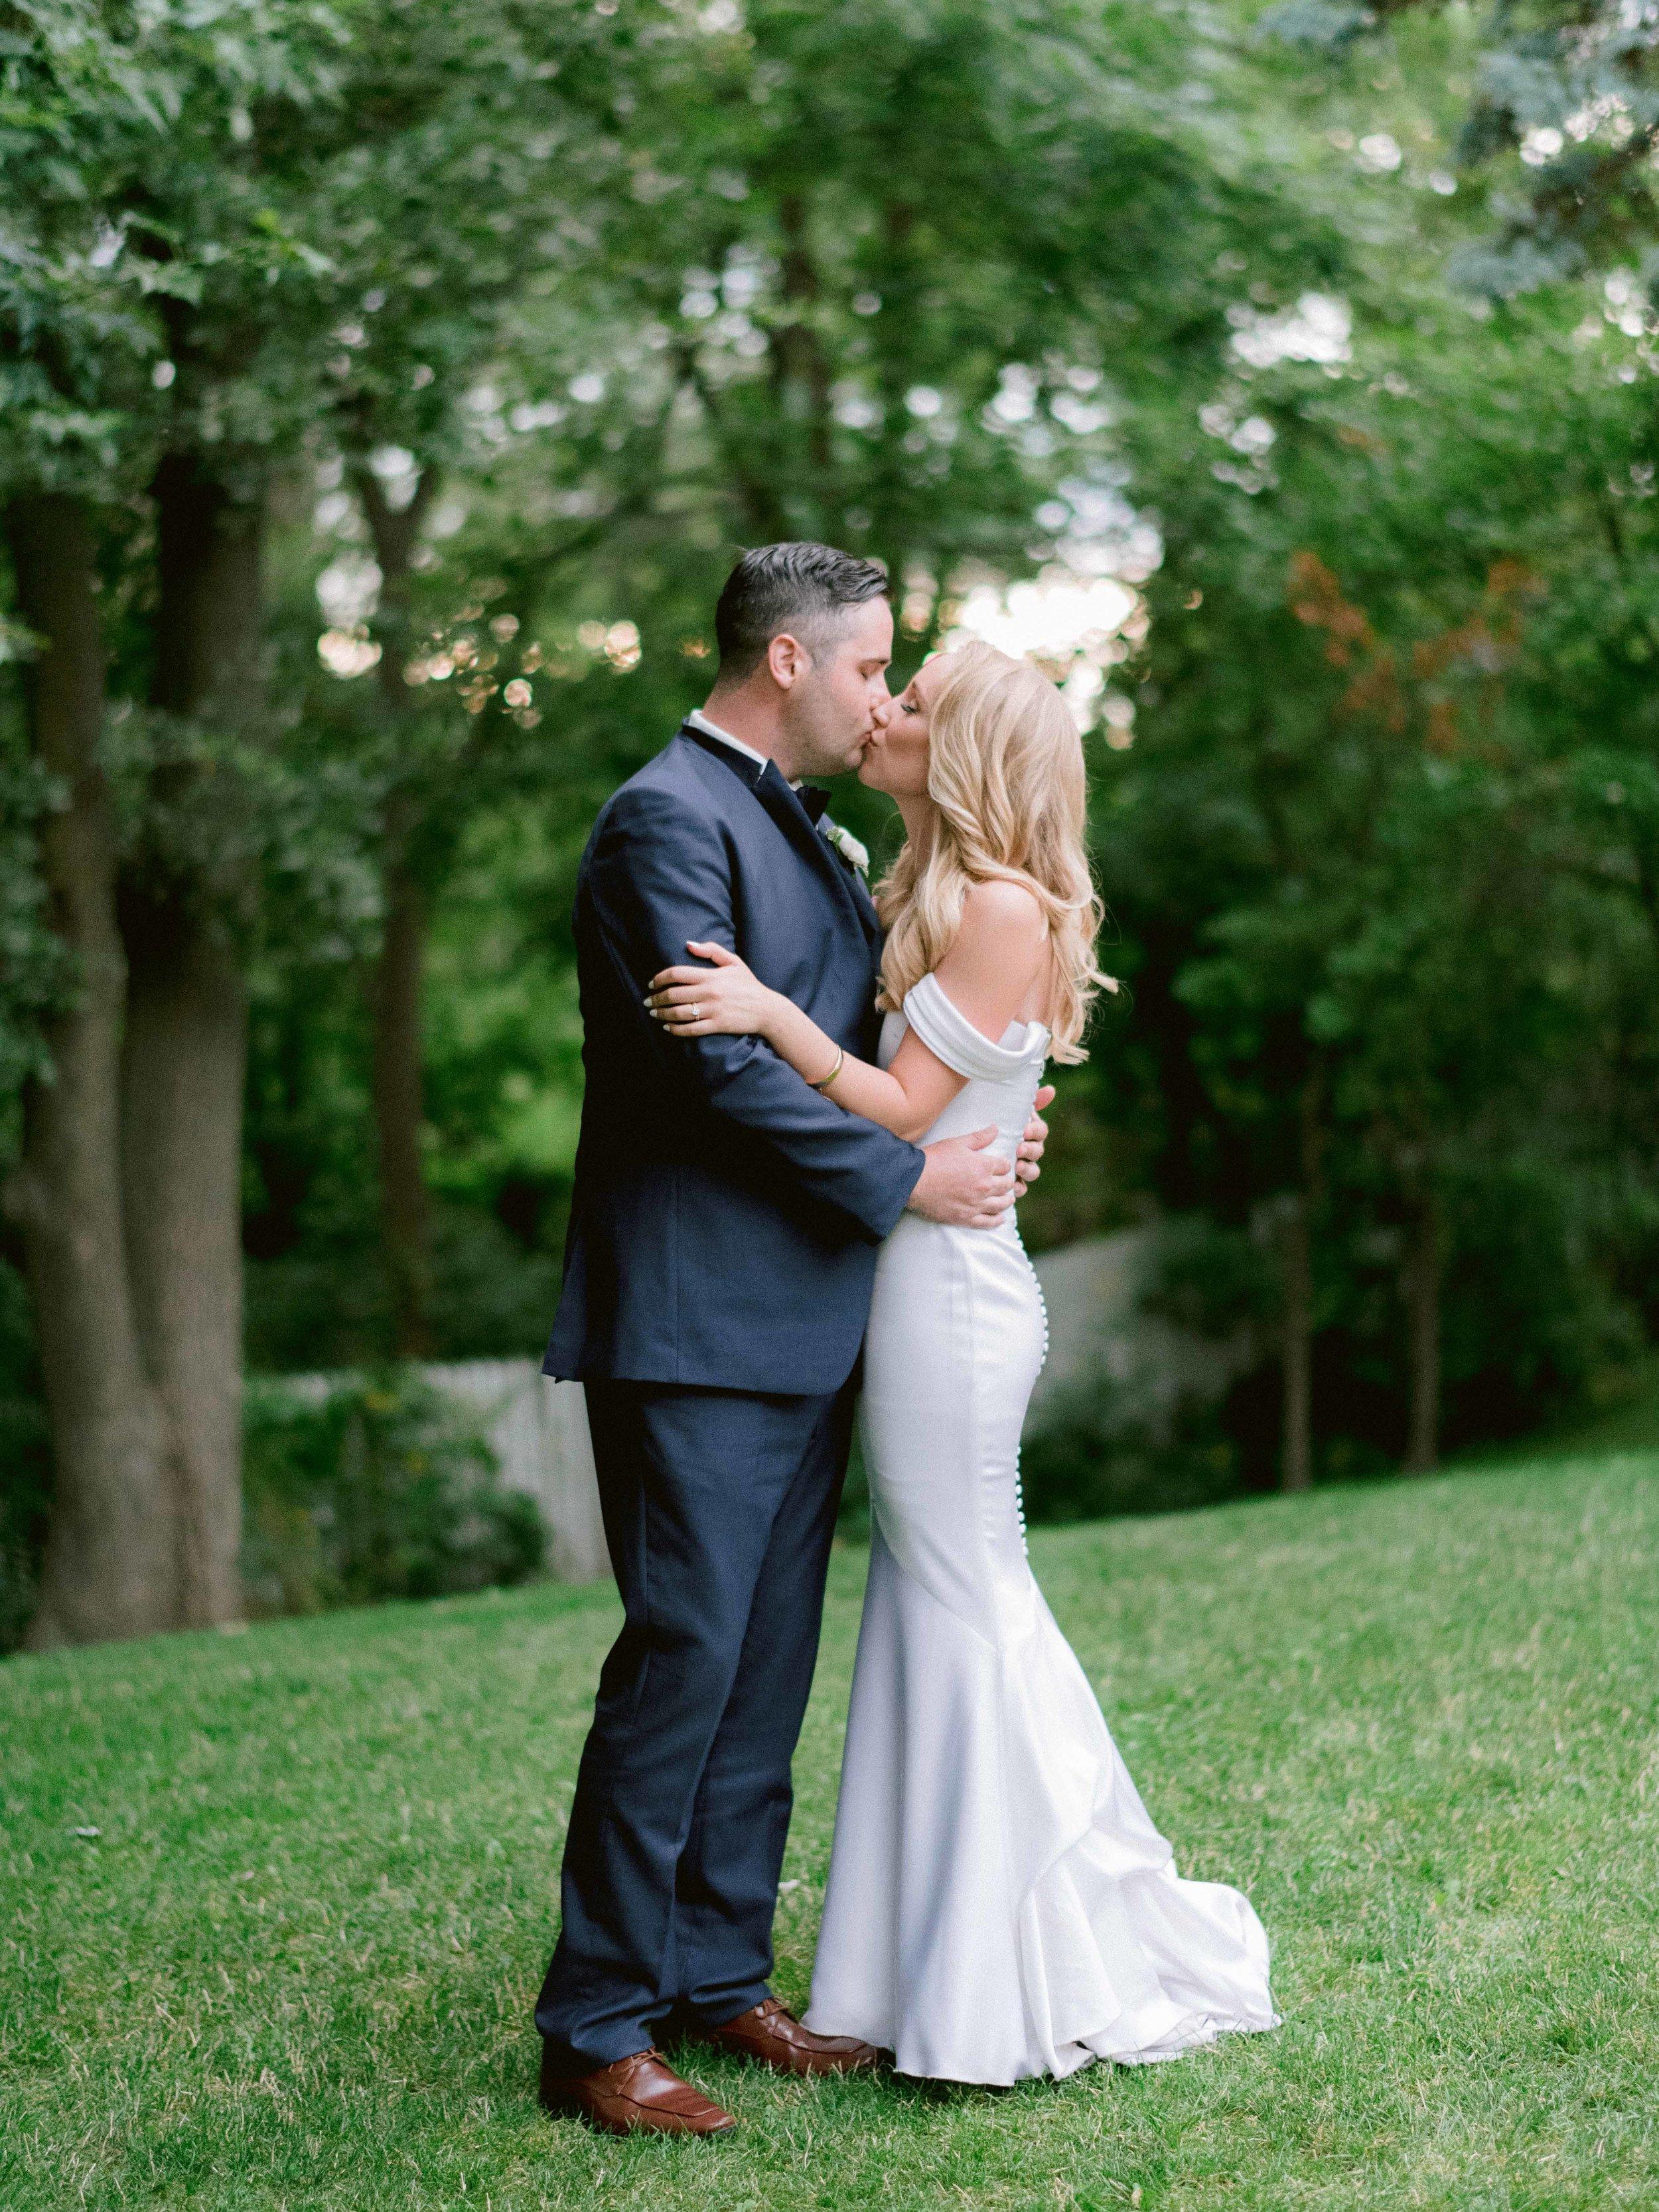 Summer_Engagament_Session_Toronto_Niagara_Wedding_Photographer (1 of 3).jpg